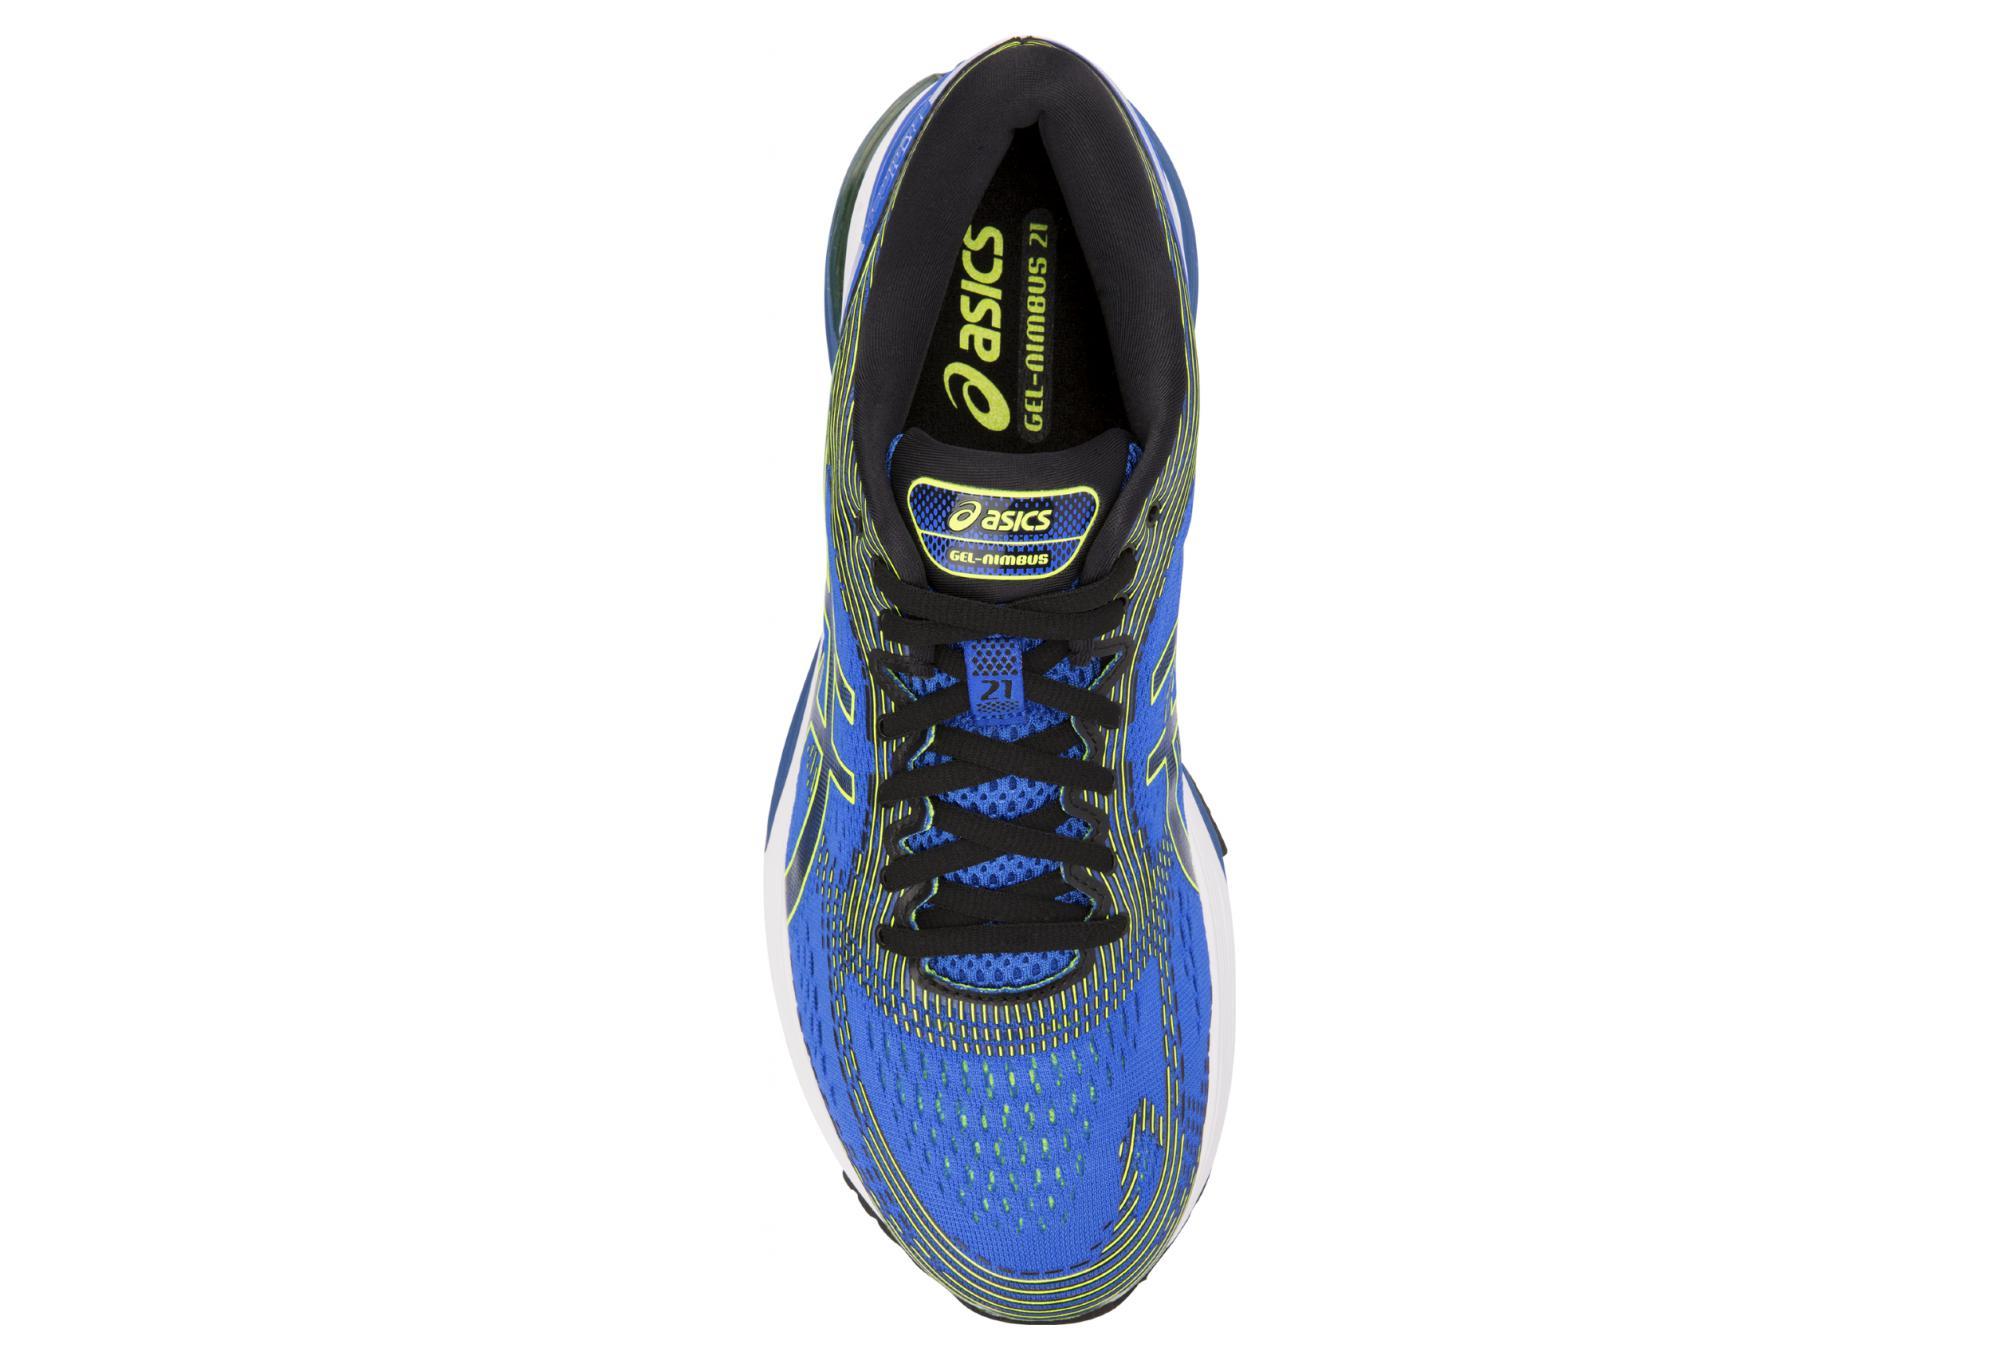 Verde Scarpe Nimbus Asics Blu 21 Run Gel it Alltricks q4BWYBcr